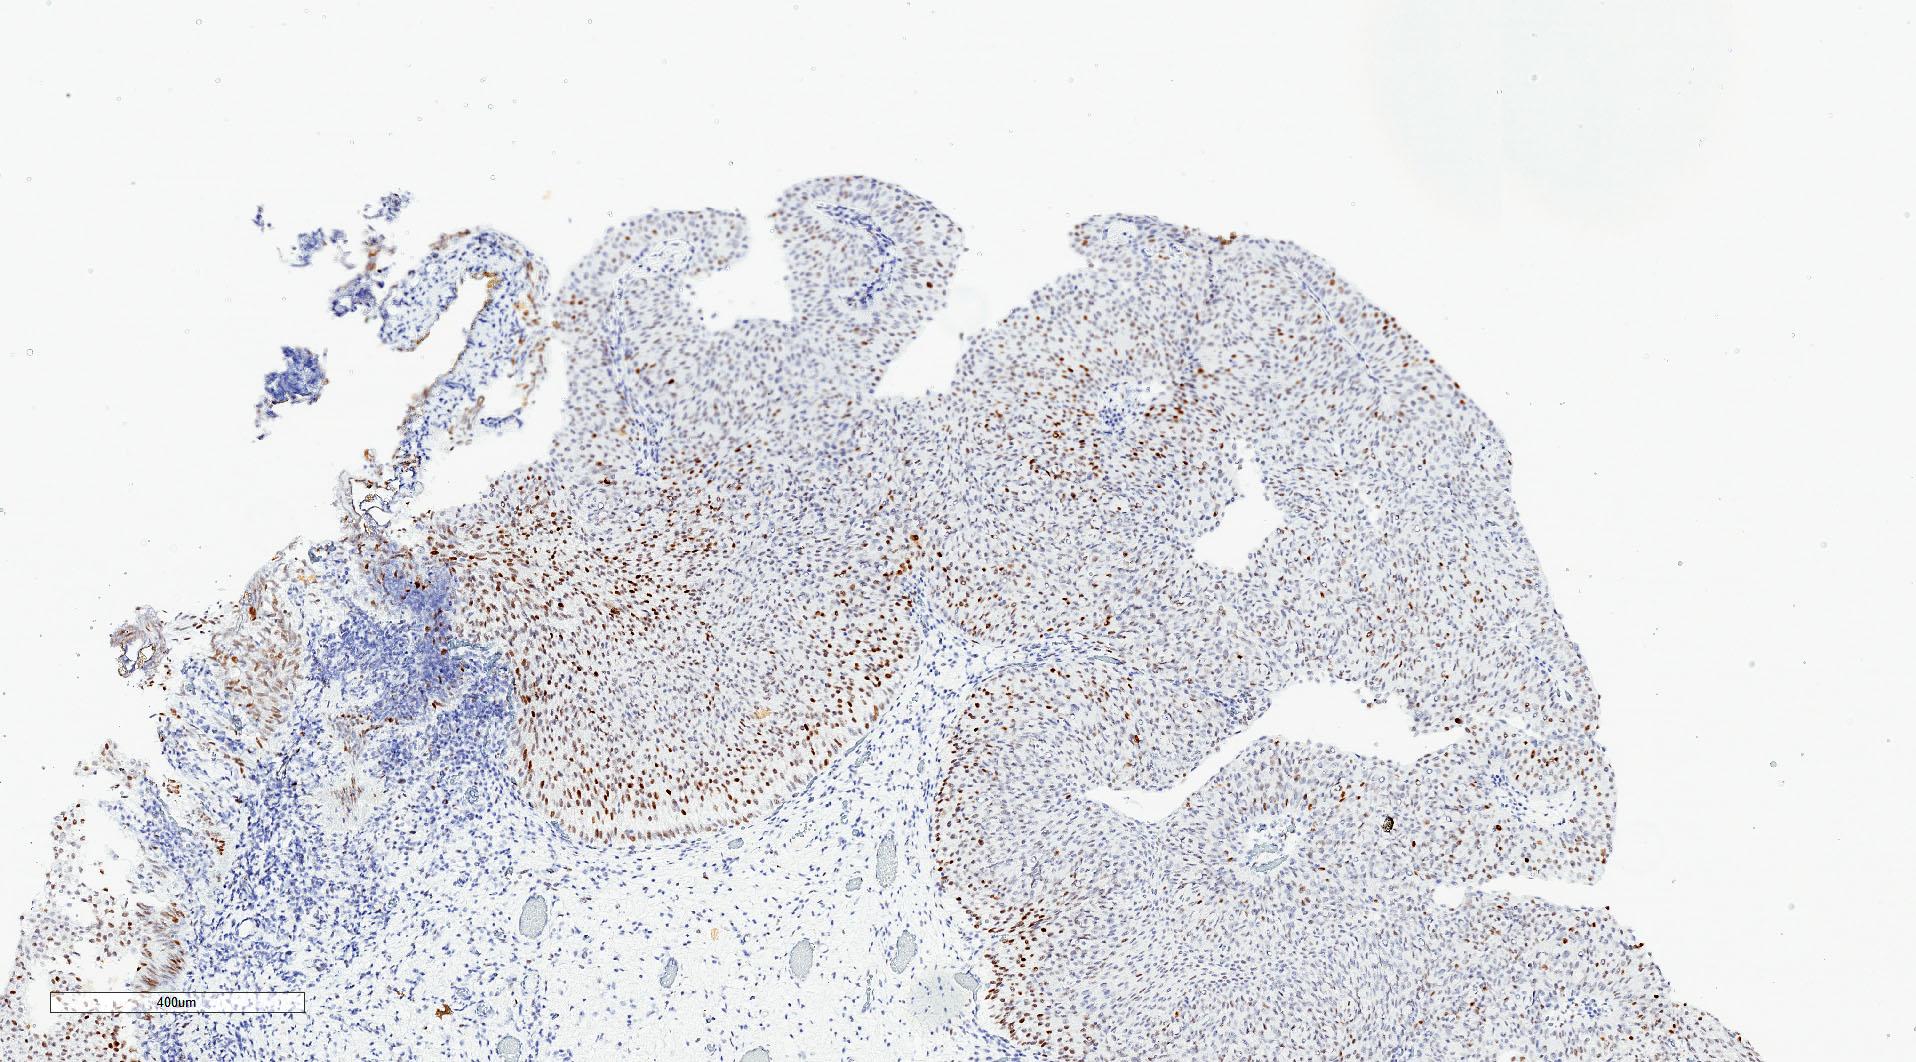 p53 staining